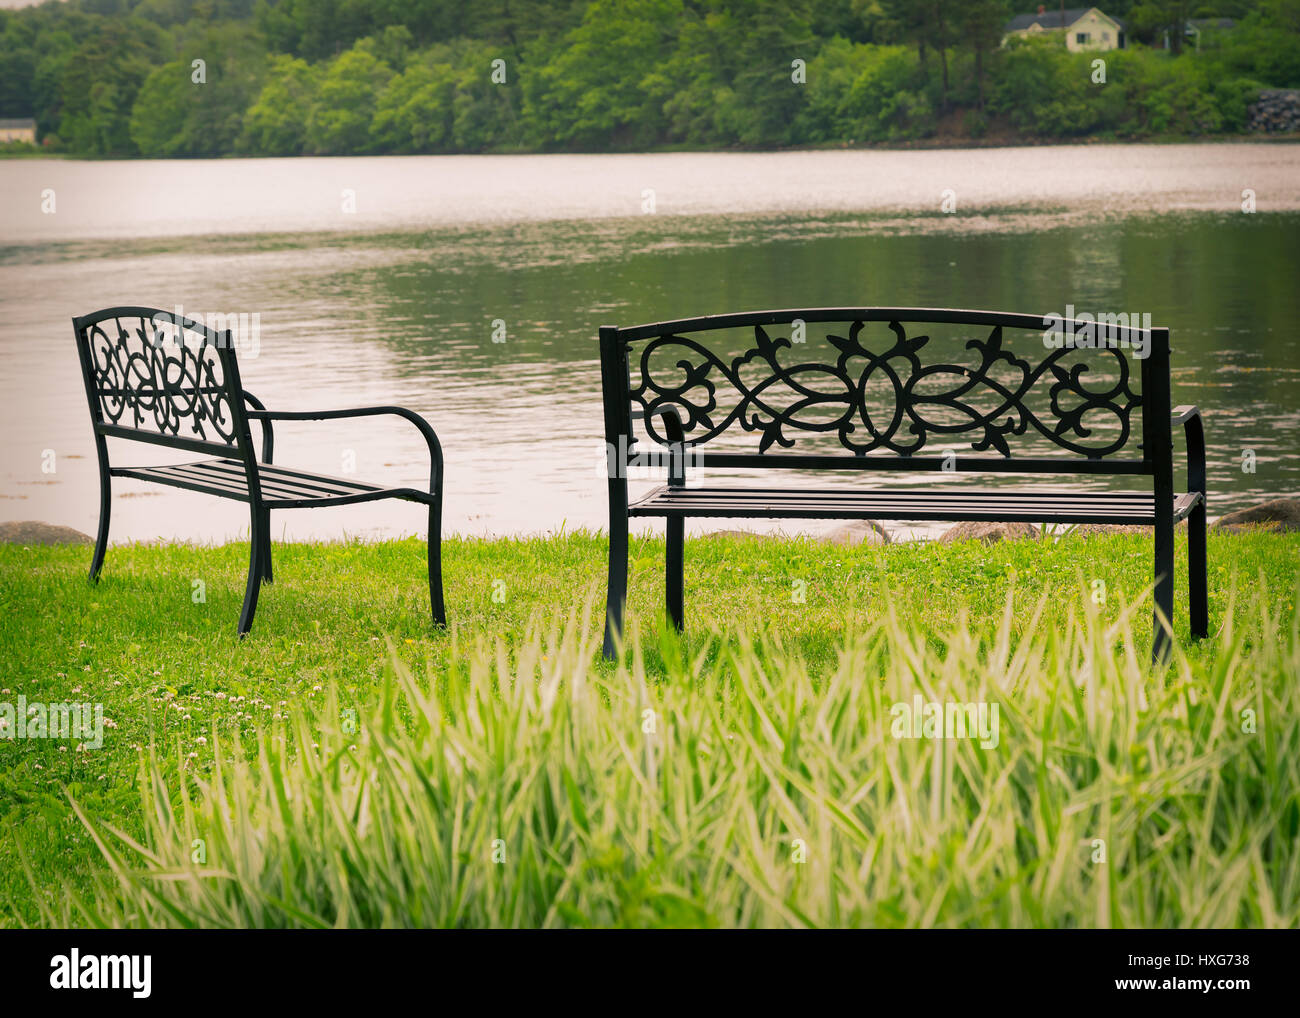 Decorative metal park benchs overlooking still water. - Stock Image